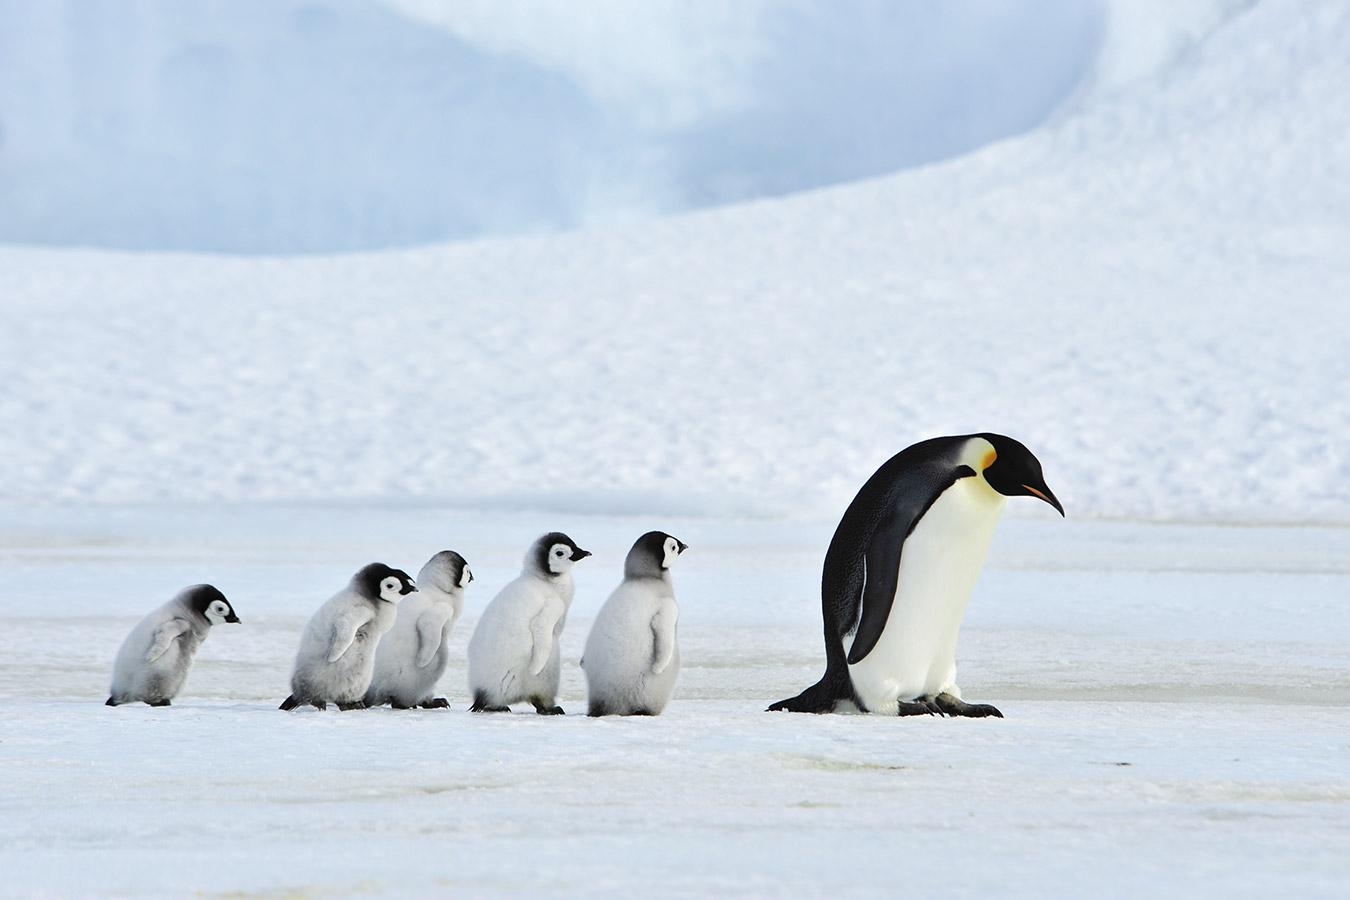 41.-43. trening: Pingvini, kriza i promjena polumaratona